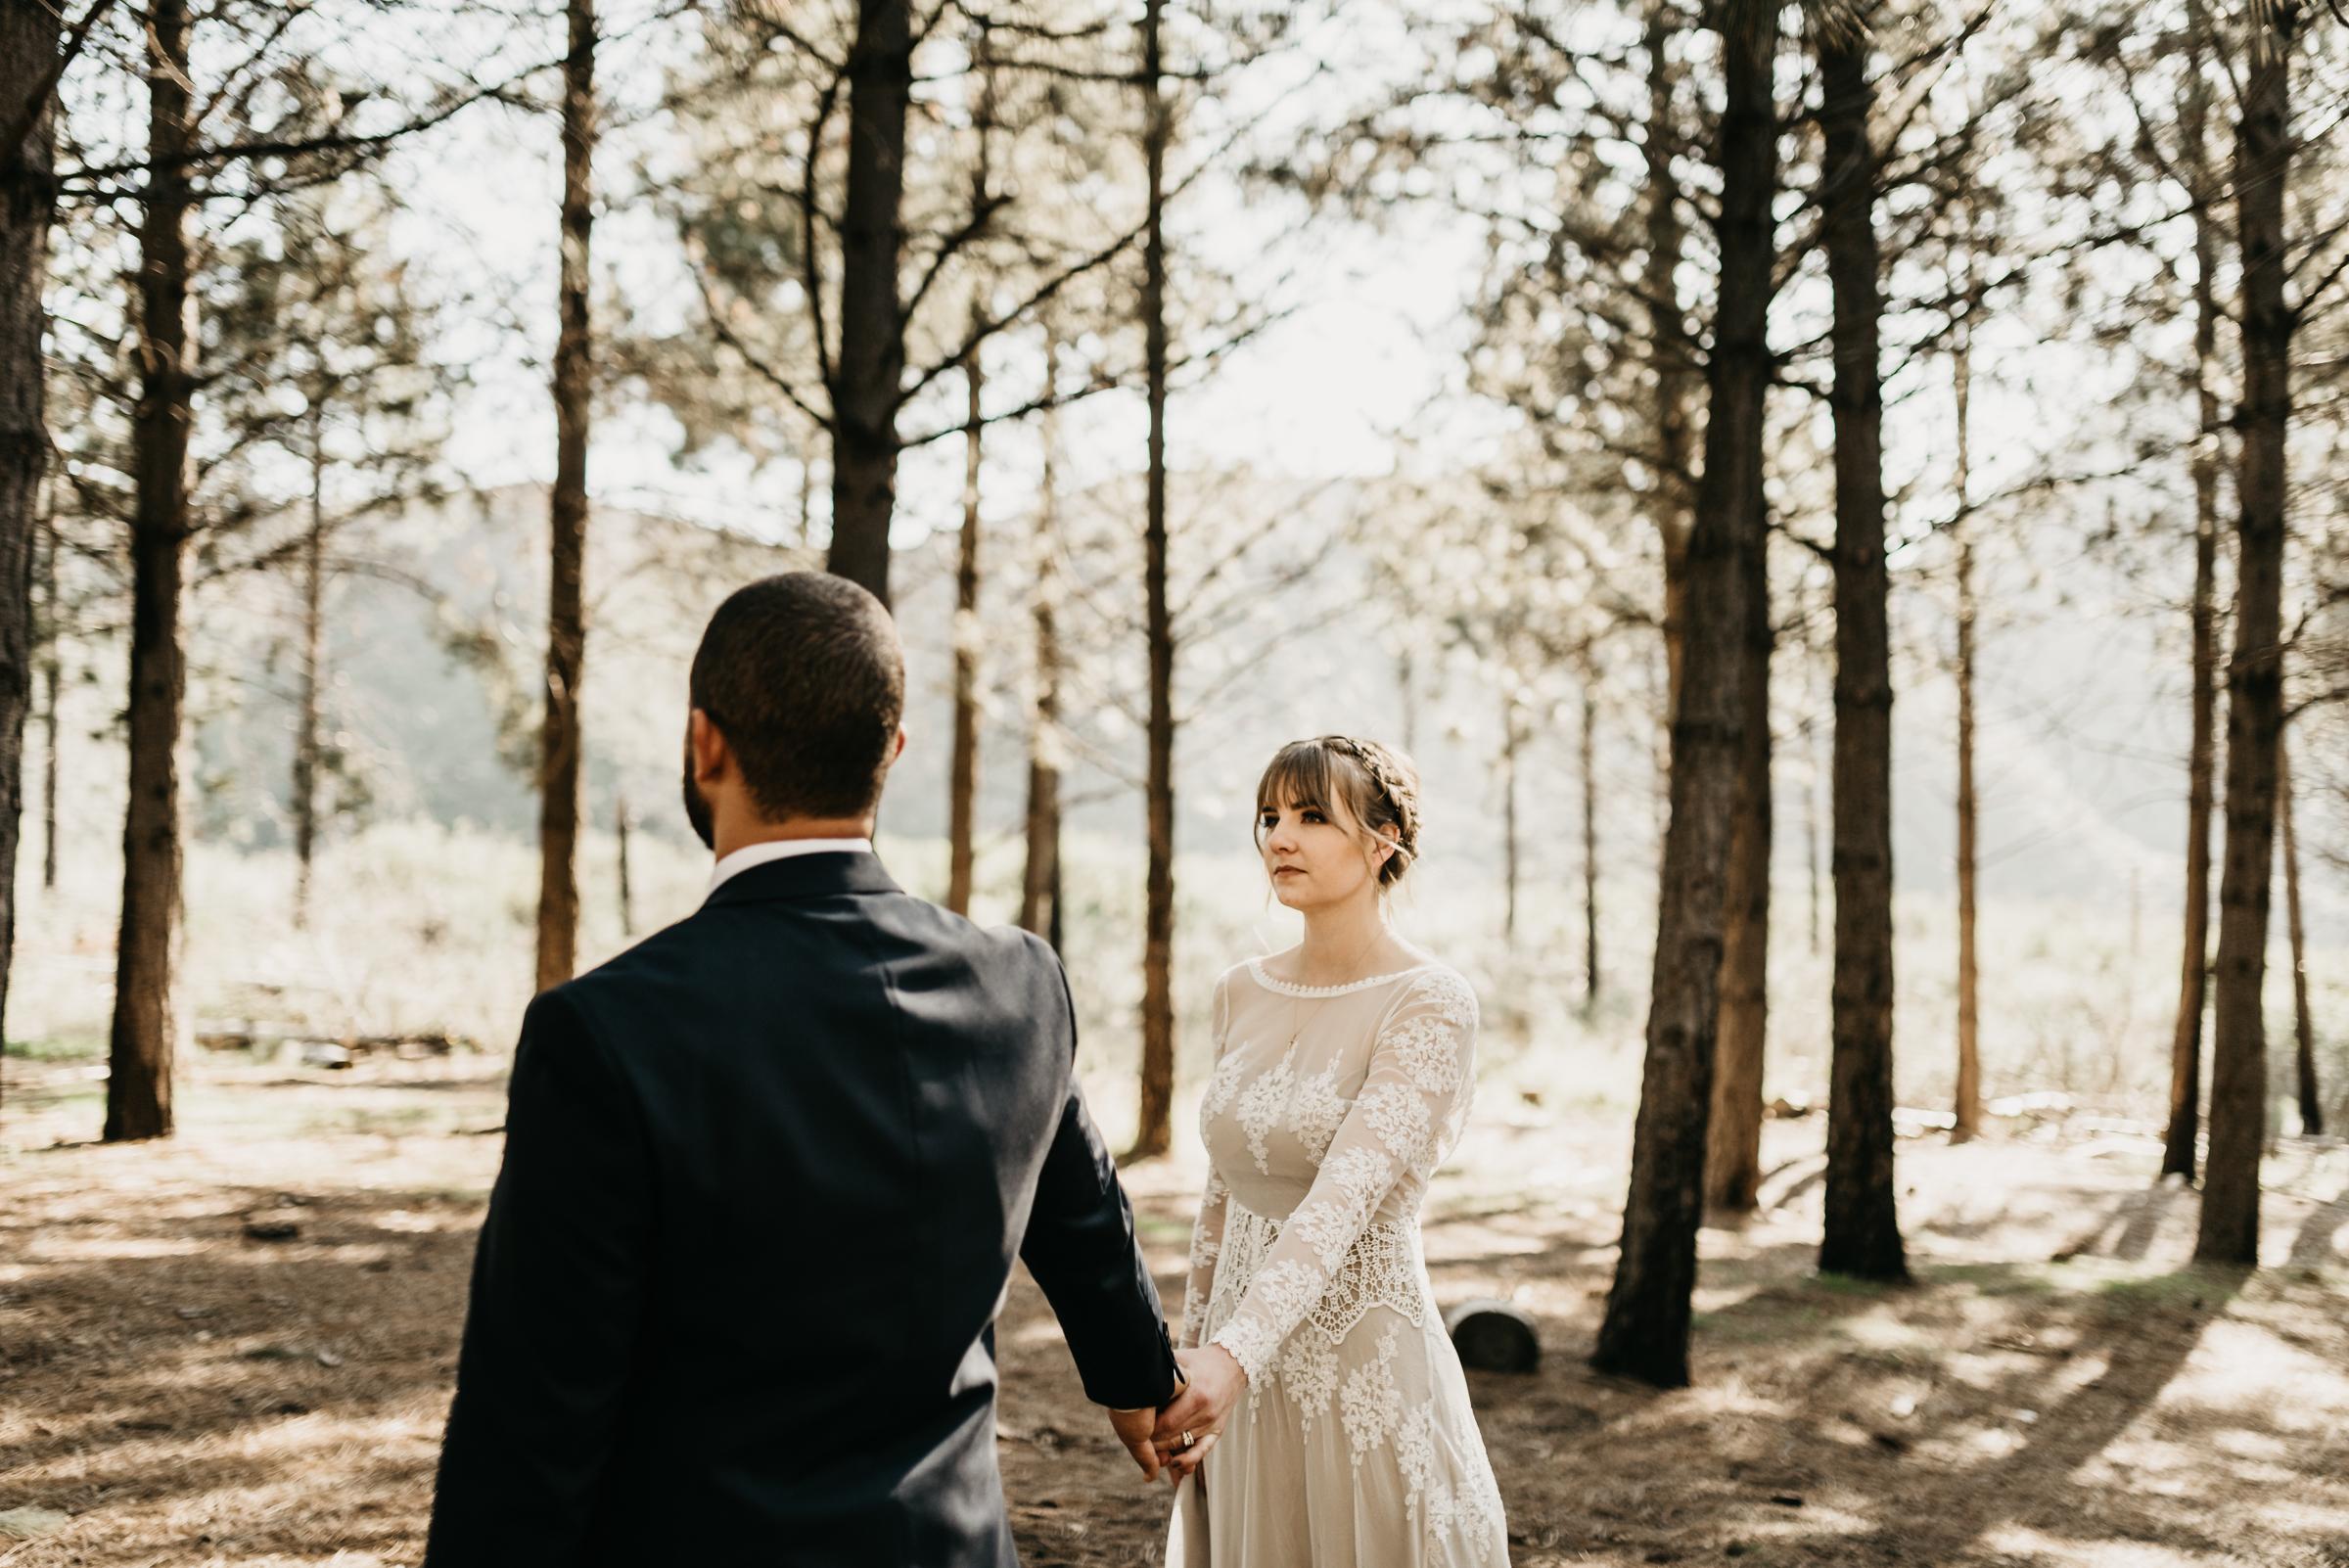 ©Isaiah + Taylor Photography - Los Angeles Wedding Photographers - Los Angeles Forest Wedding -25.jpg